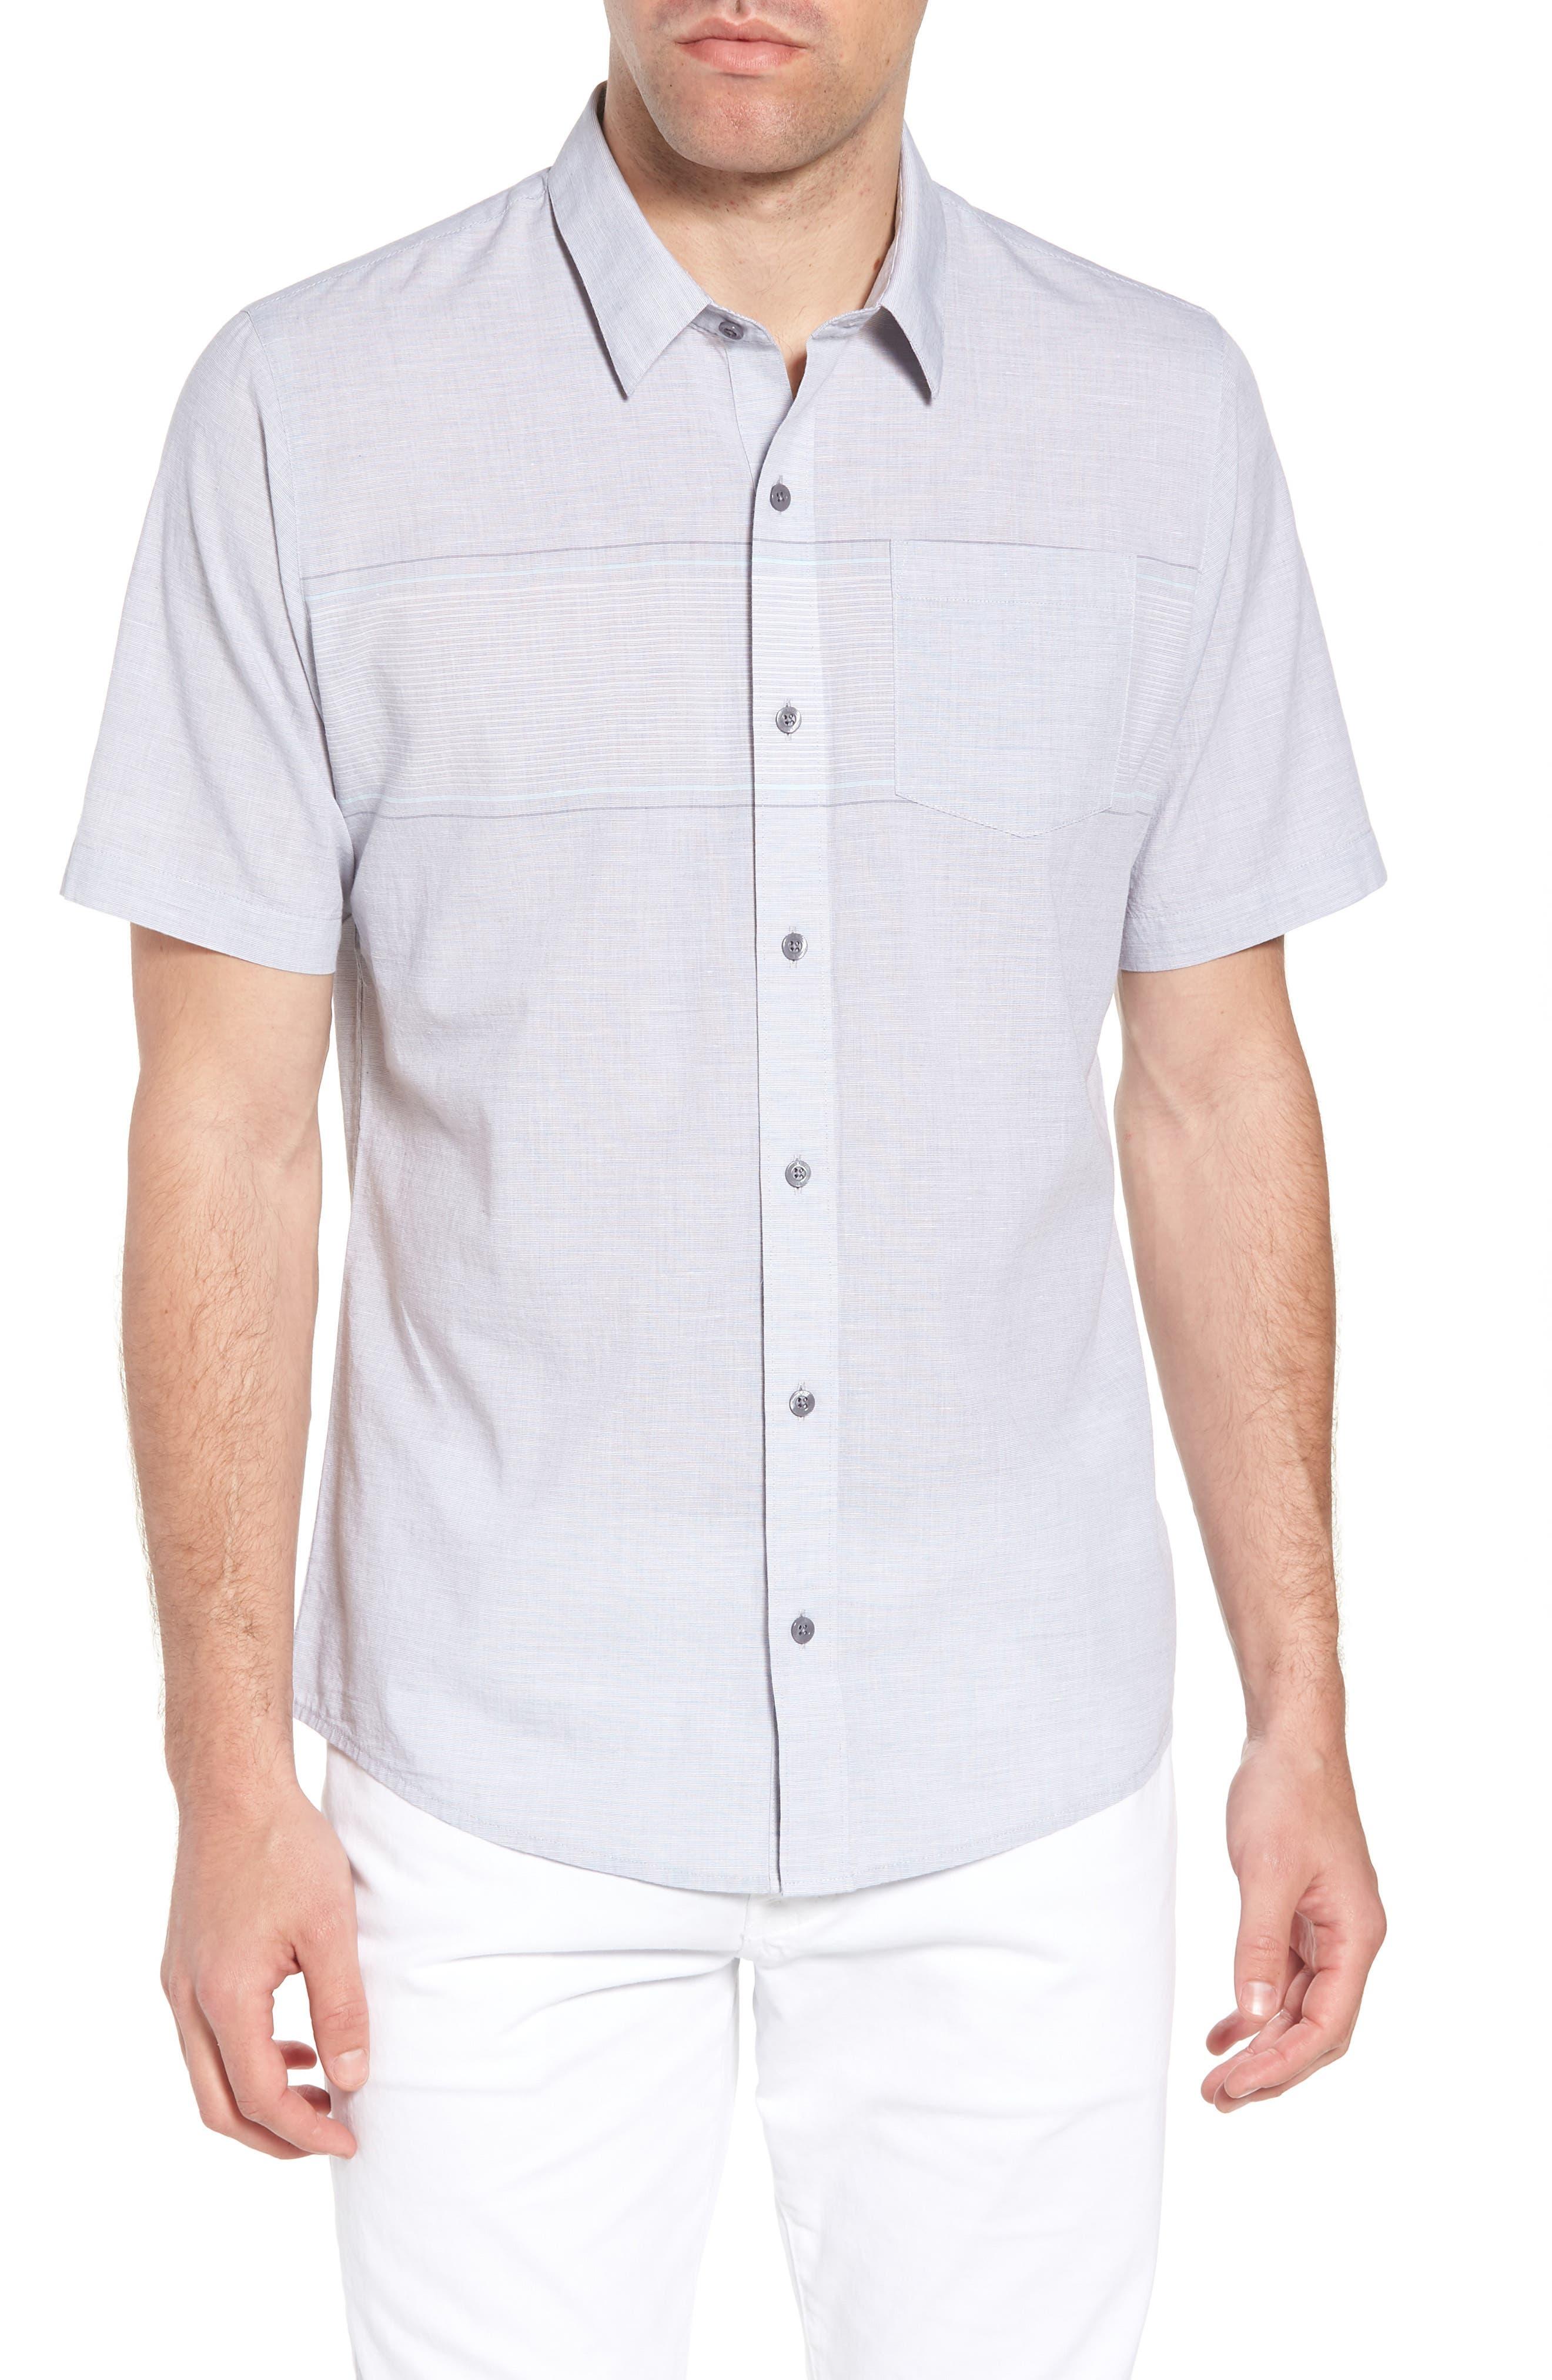 Oscar Regular Fit Sport Shirt,                             Main thumbnail 1, color,                             HEATHER GRASILLE